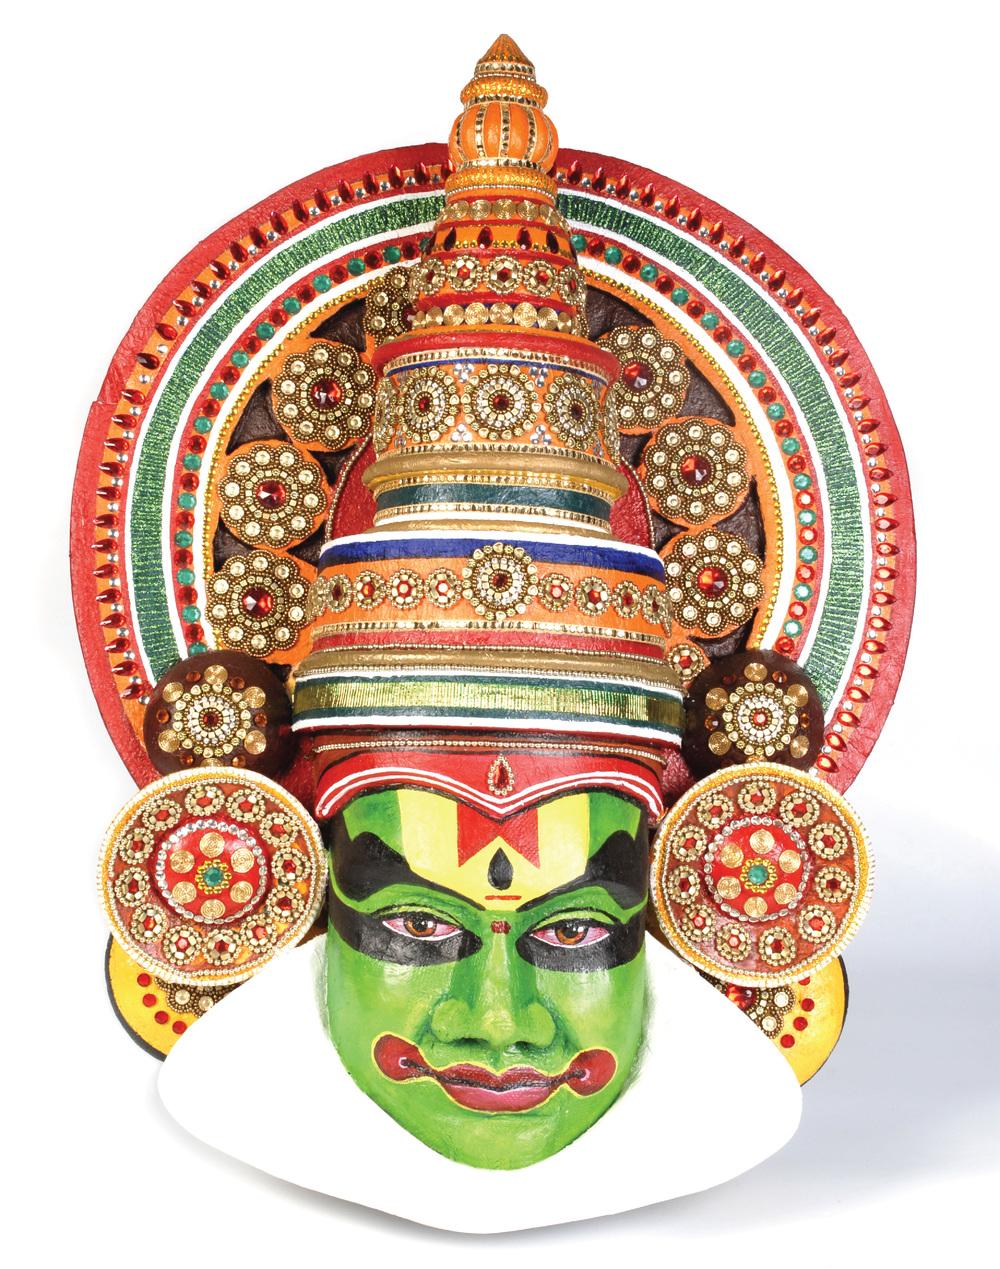 Mask clipart kathakali PAttern Kathakali Style Wall from